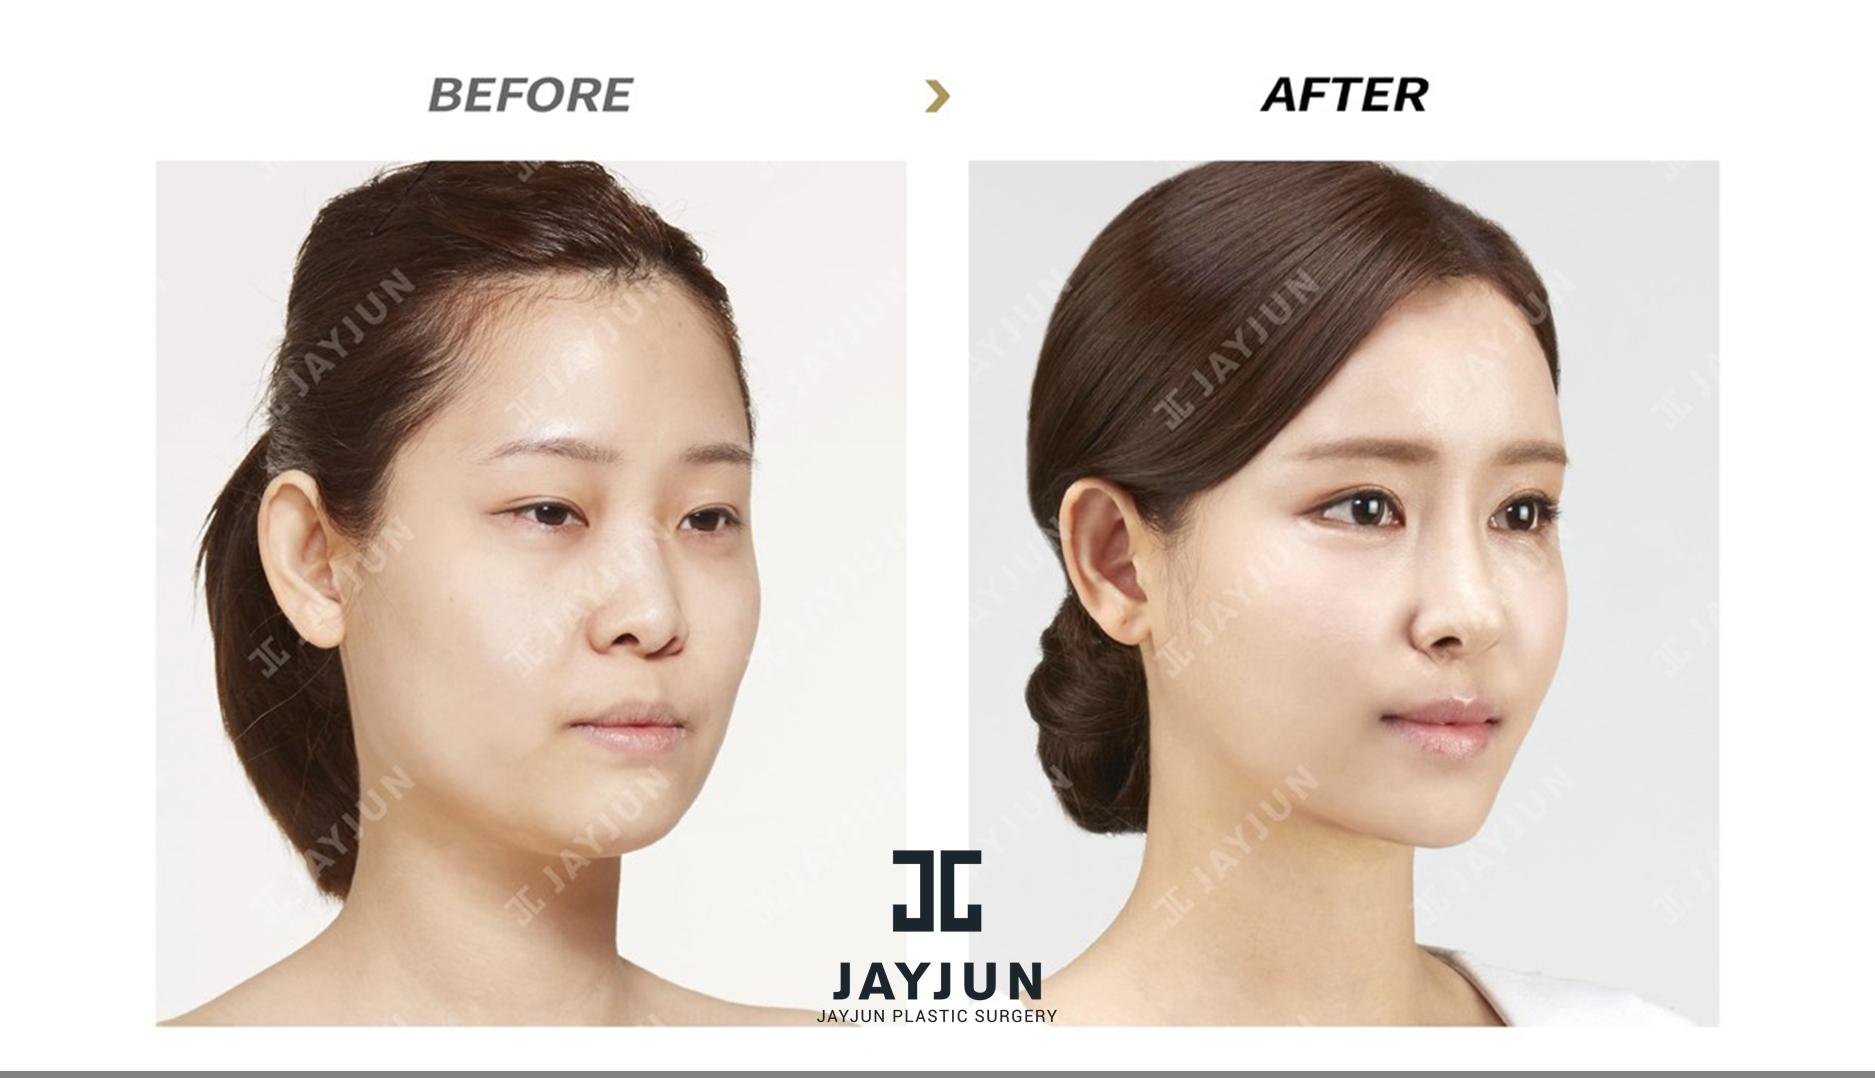 The Best Plastic Surgery In Korea Korean Star Plastic Surgery Korean Women Plastic Surgery Top Plastic Surgery In Korea Top Korean Plastic Surgery Top Plastic S Korean Plastic Surgery Plastic Surgery